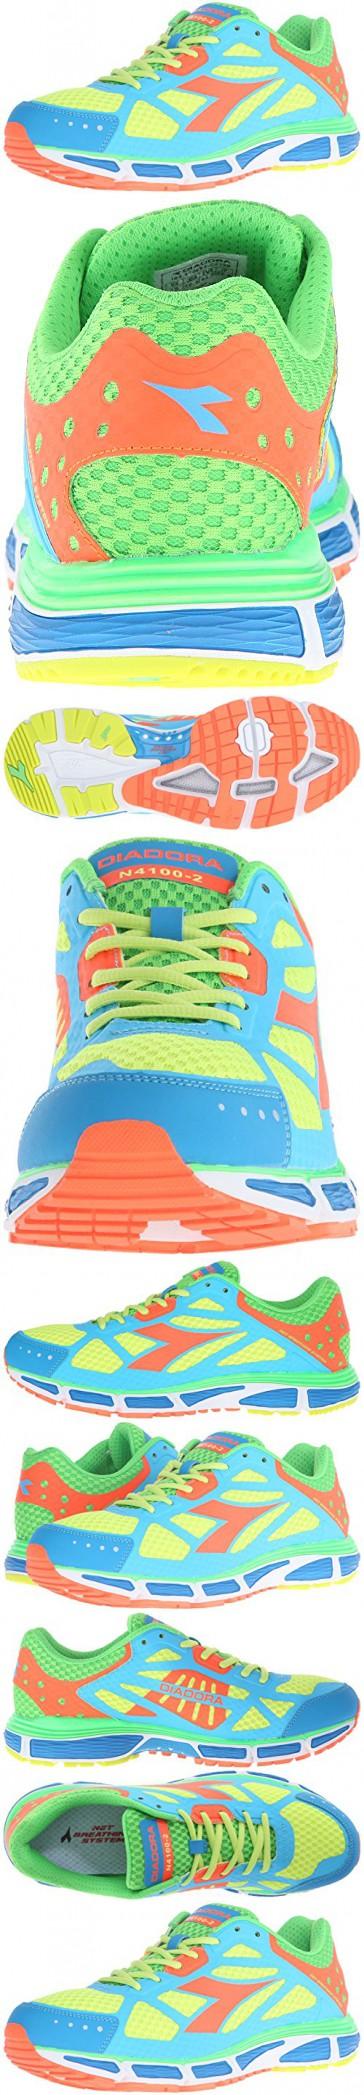 ecc18d8911f4e Diadora Men's N-4100-2 running Shoe, Royal/Orange, 9.5 M US ...